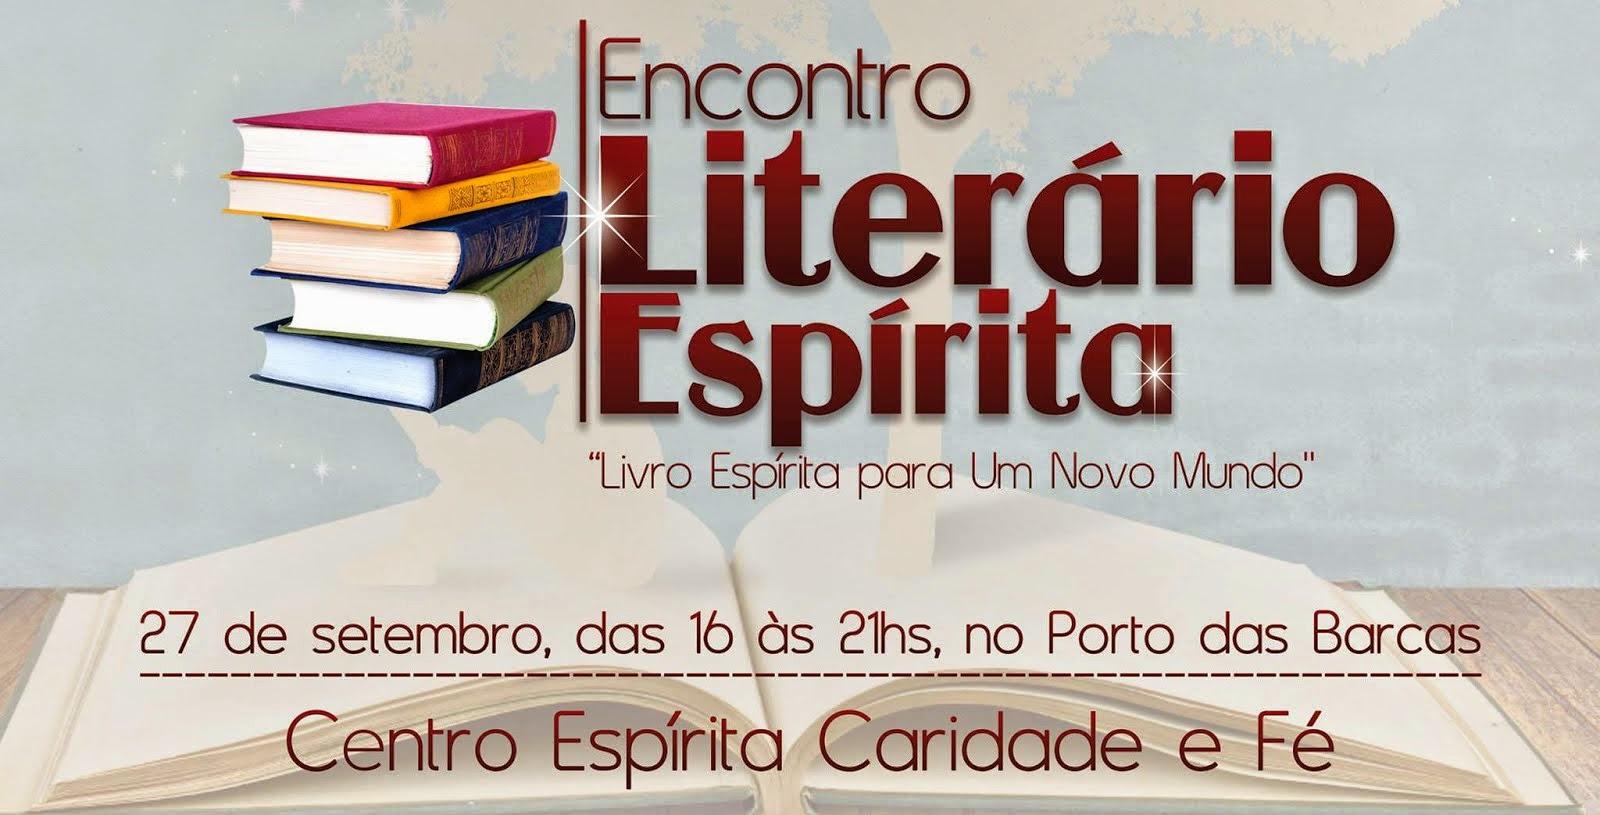 Encontro Literário Espírita